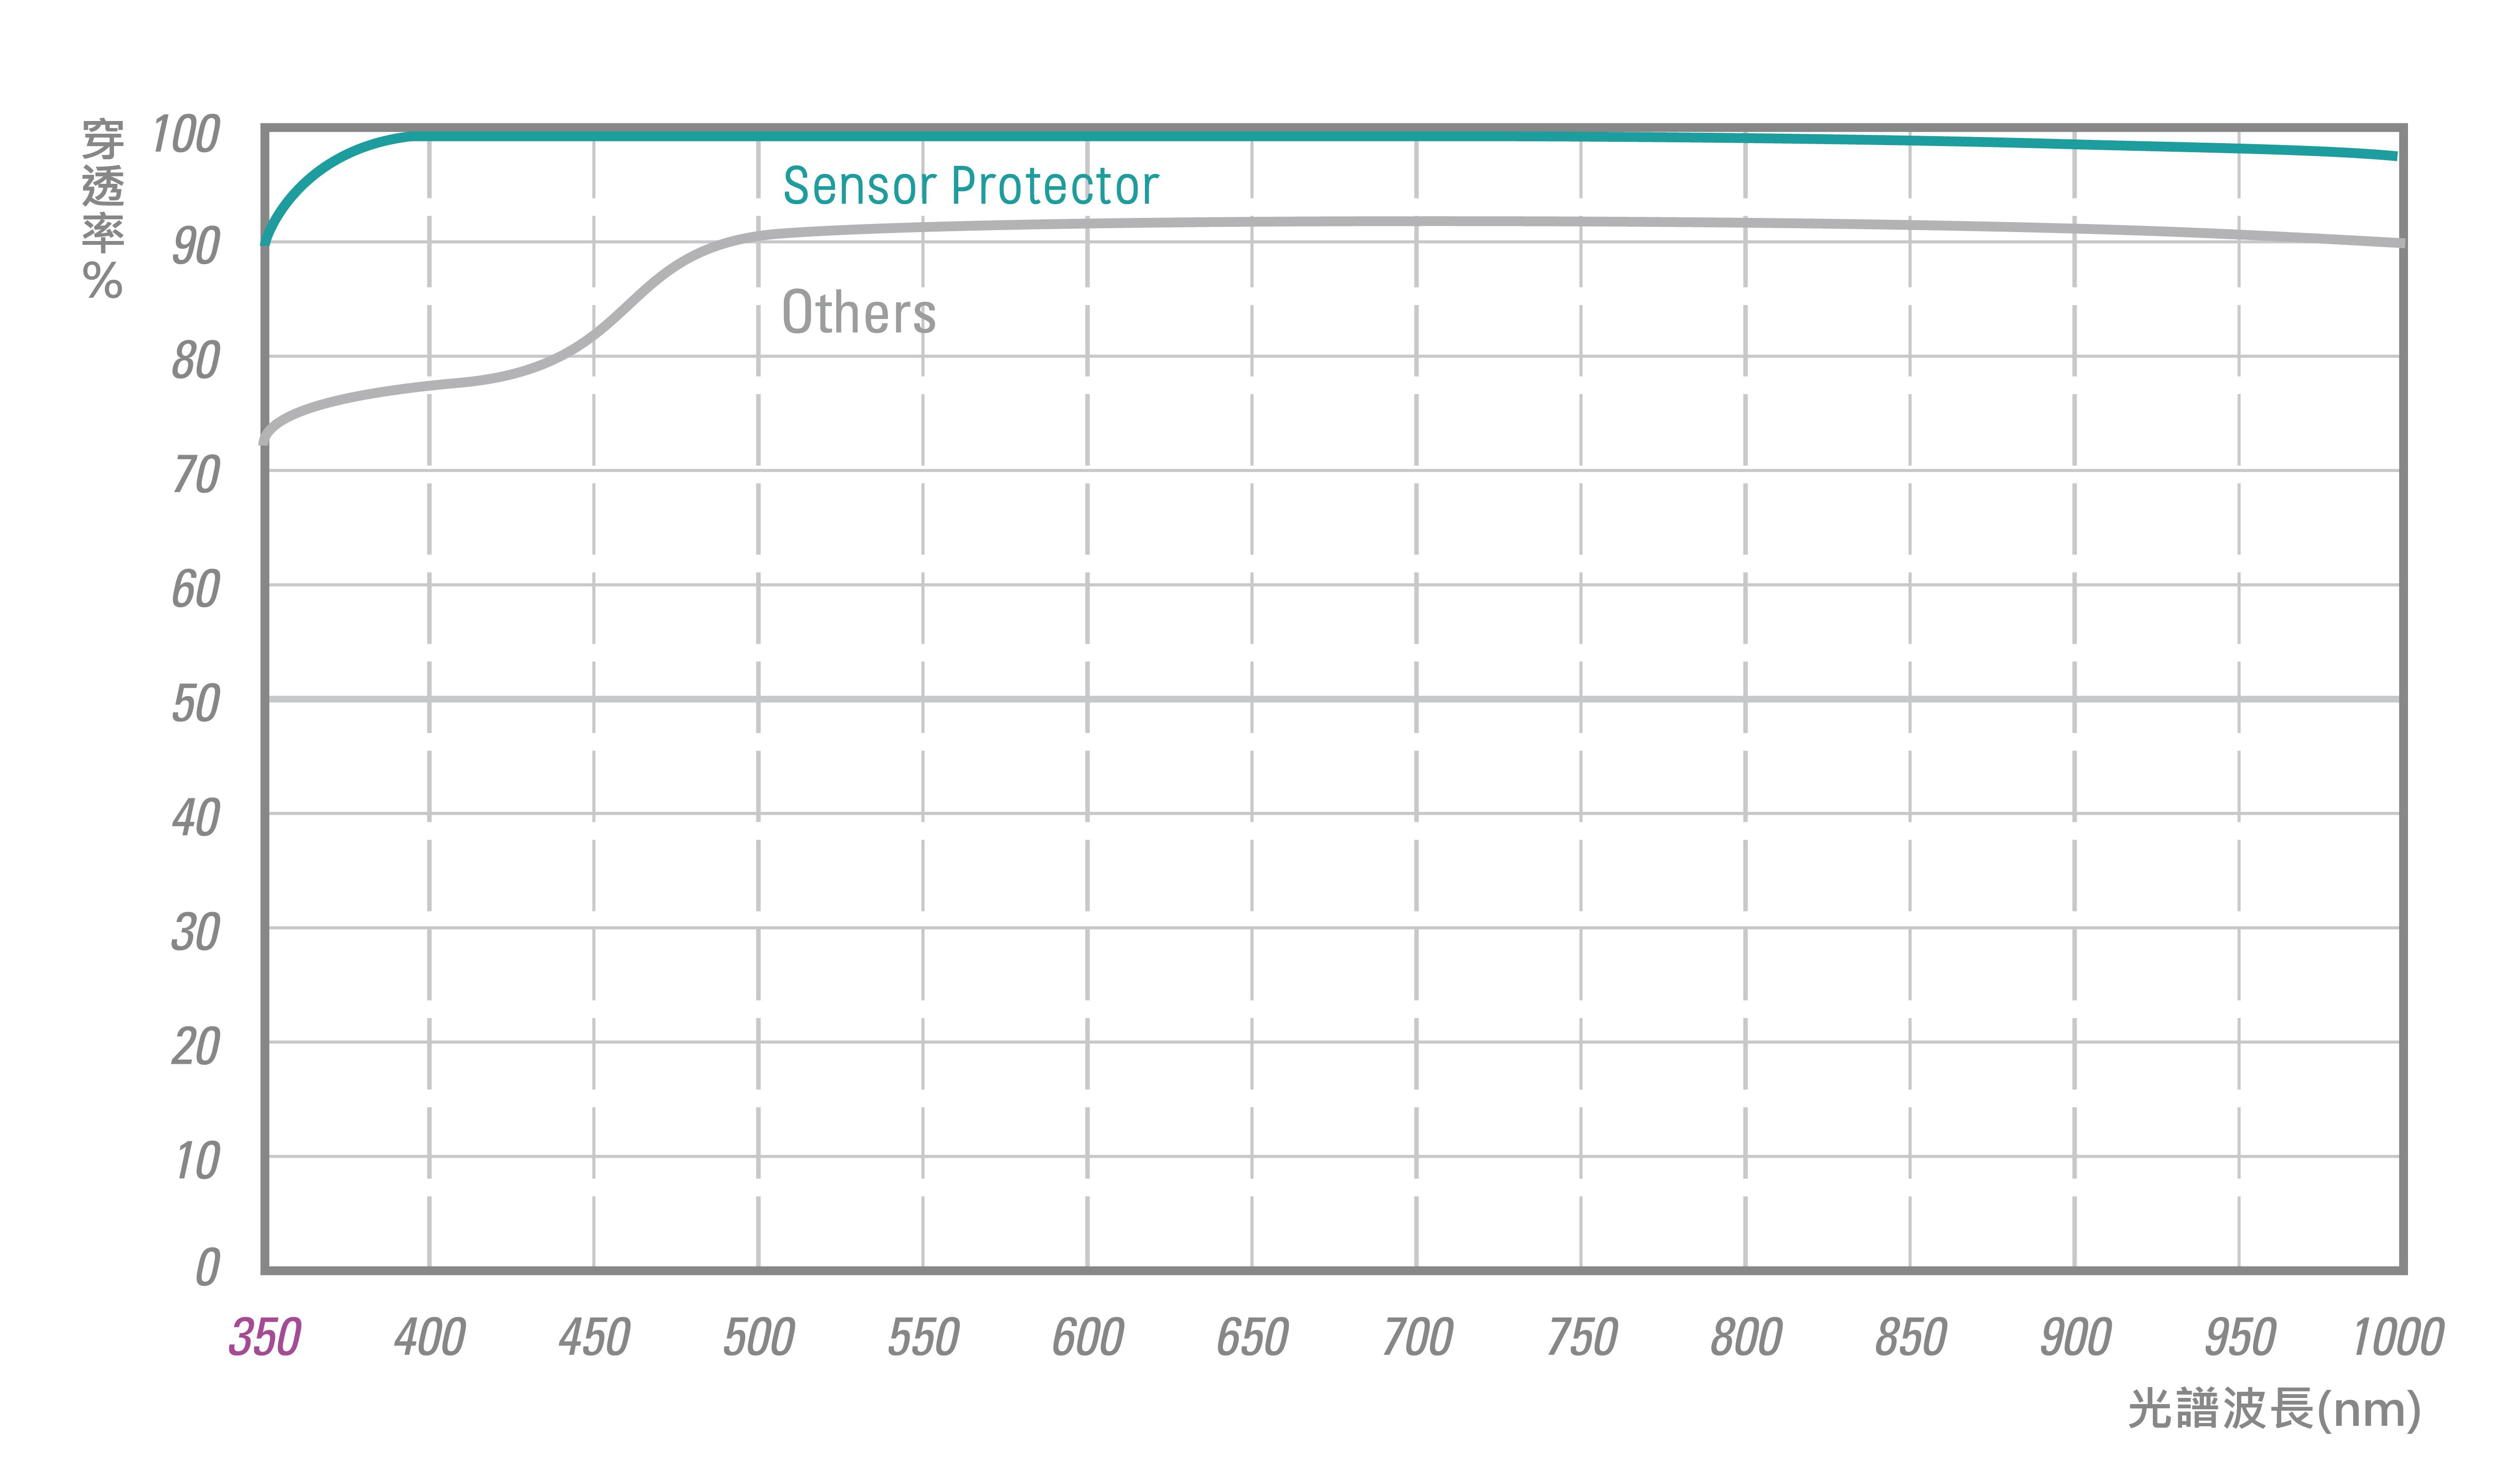 sensor-protector-spectrum-cn-01.jpg